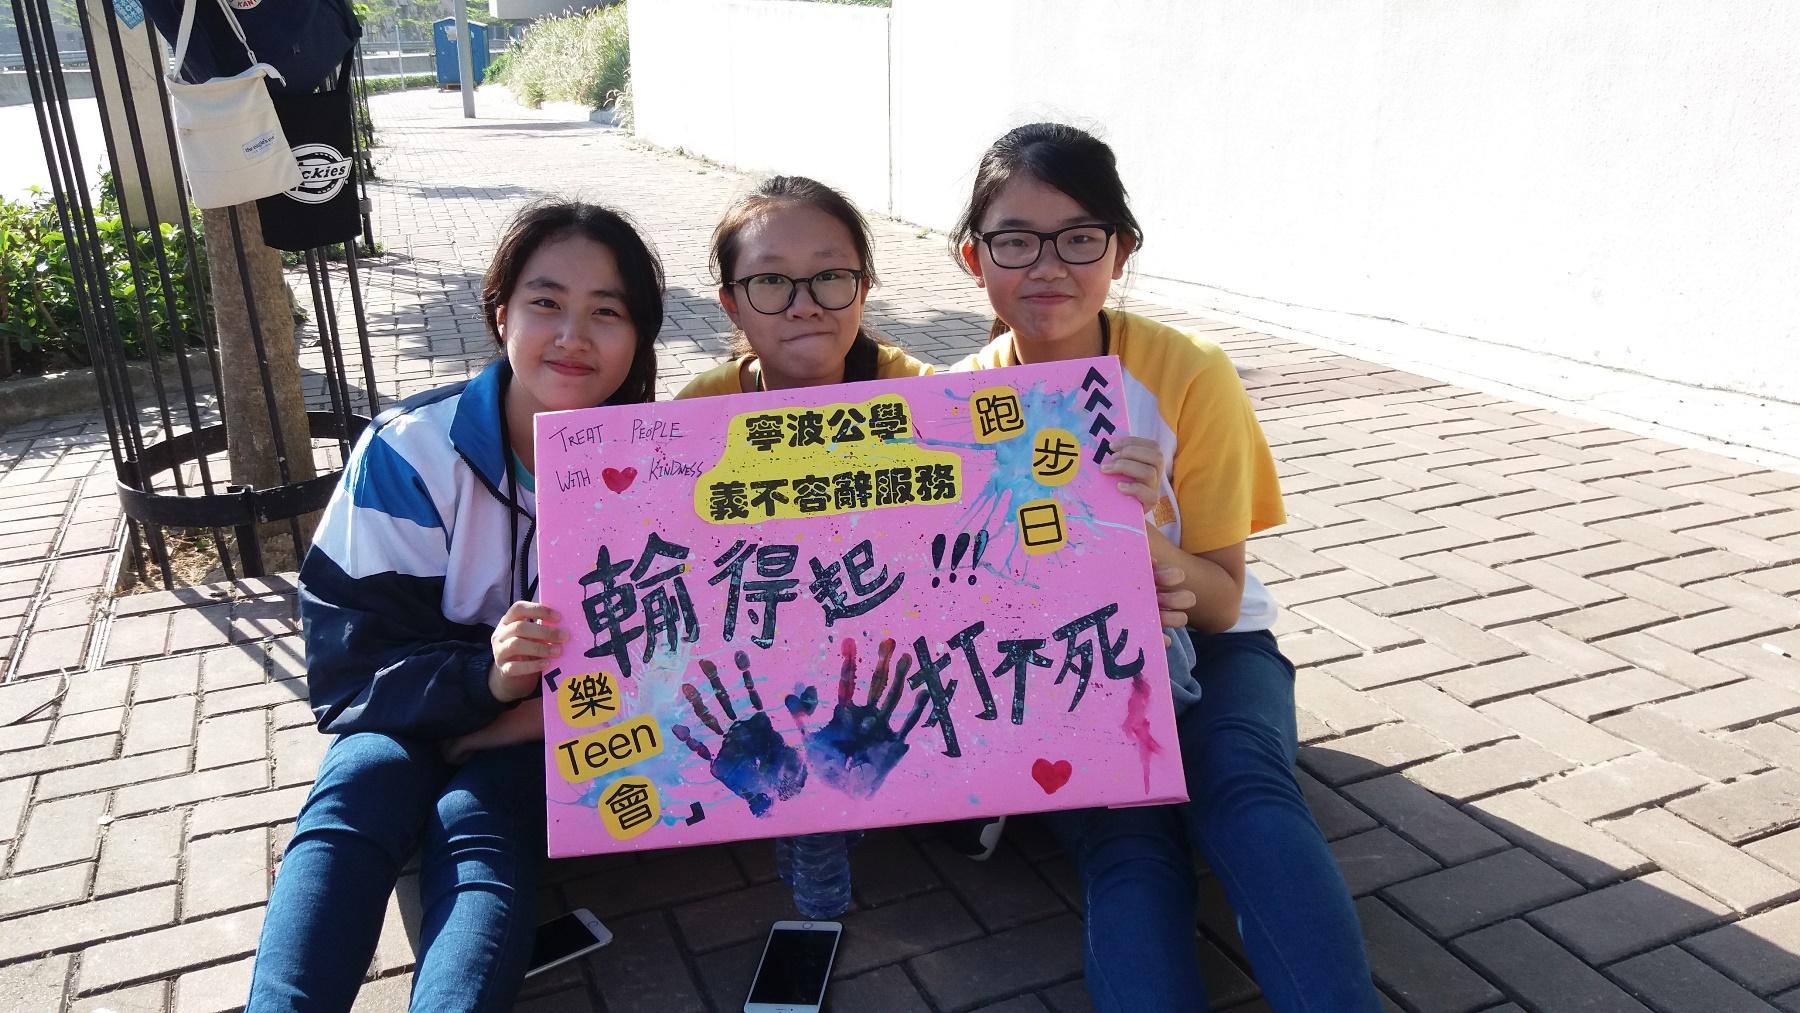 http://npc.edu.hk/sites/default/files/20181111_152300.jpg